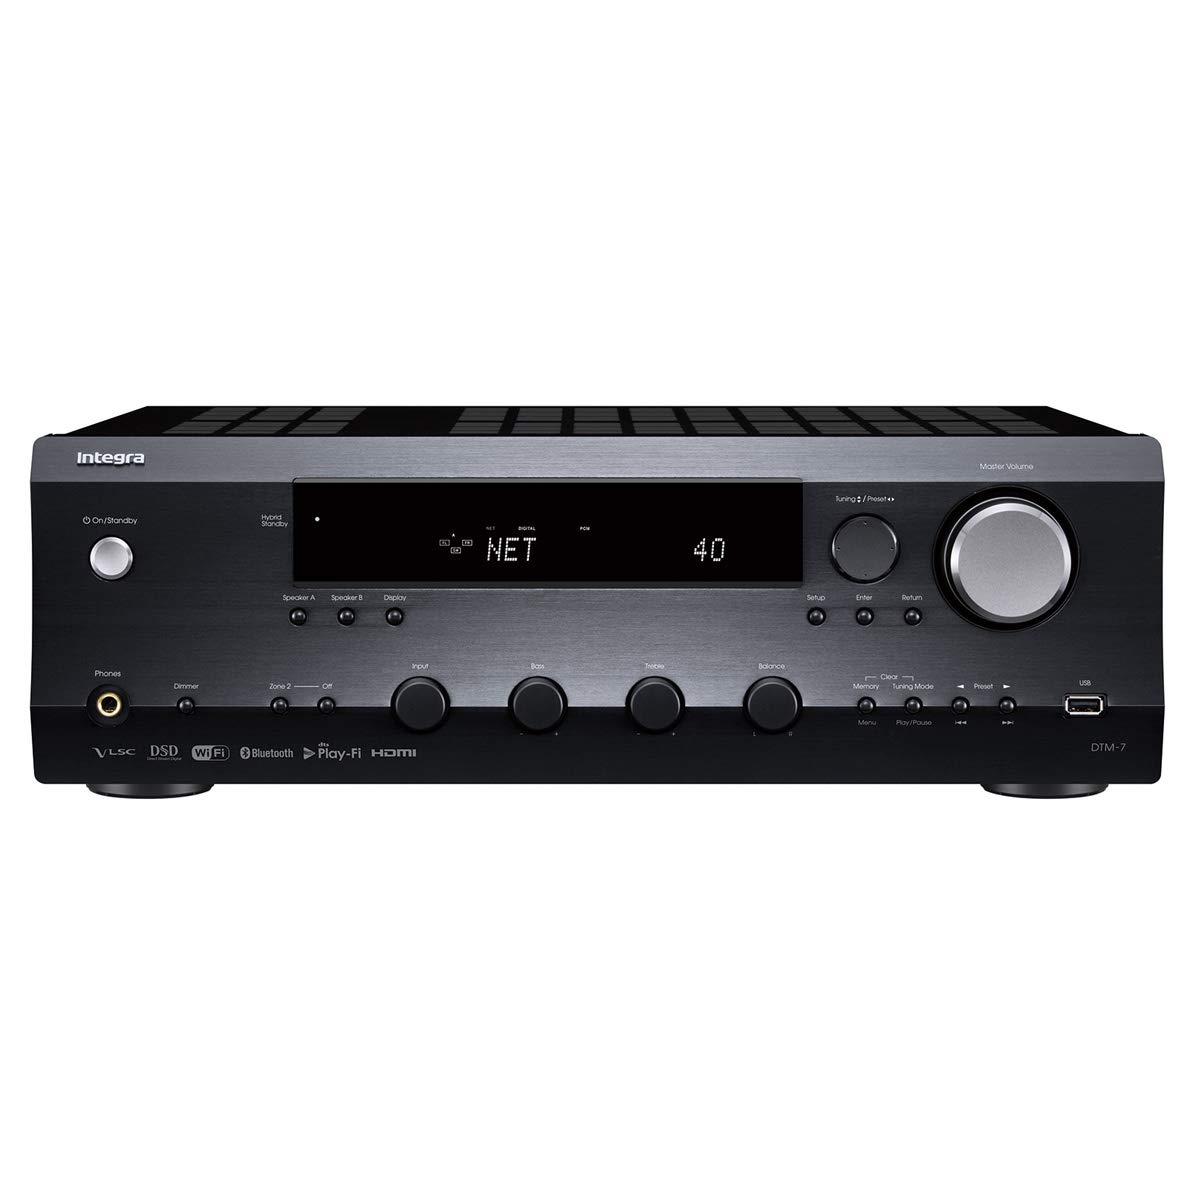 Integra DTM-7 Network A/V Stereo Receiver by Integra